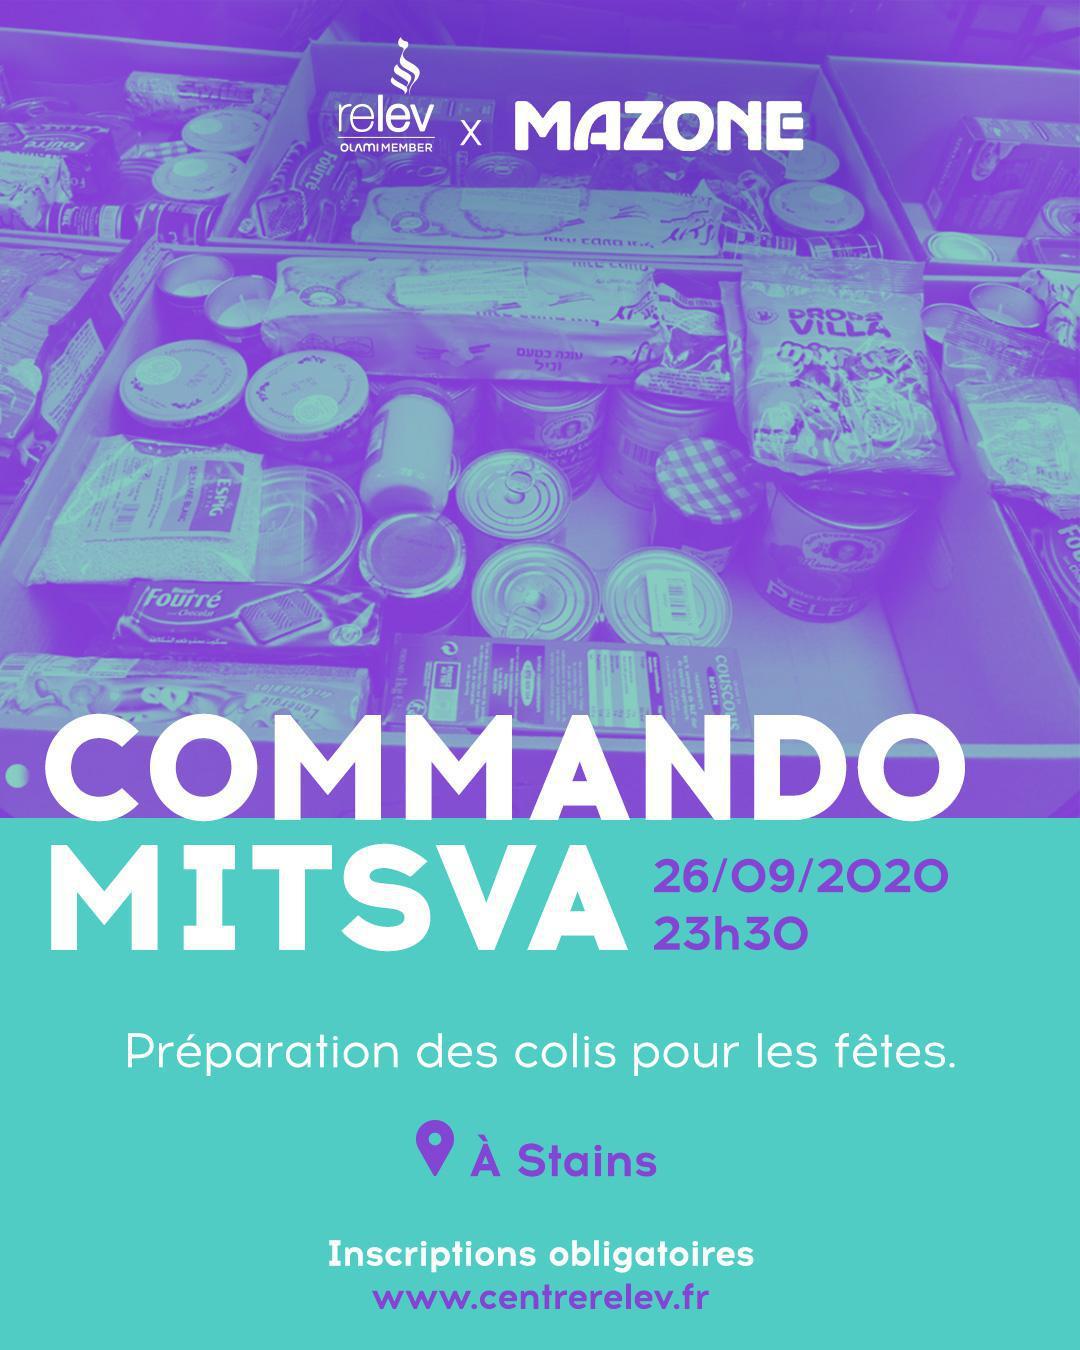 COMMANDO MITSVA x MAZONE - Mission préparation de colis